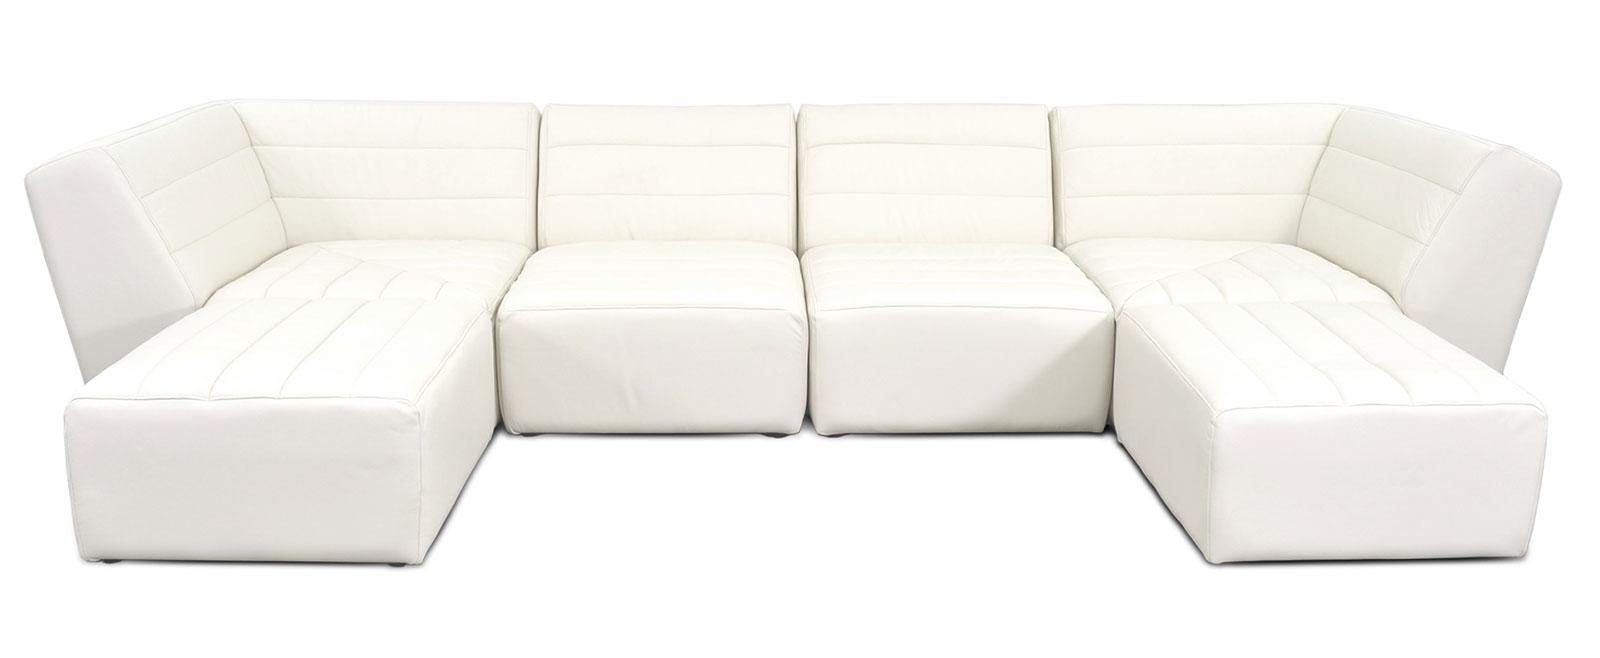 Armless chair and ottoman - 2 Corners 2 Armless Chairs 2 Ottomans